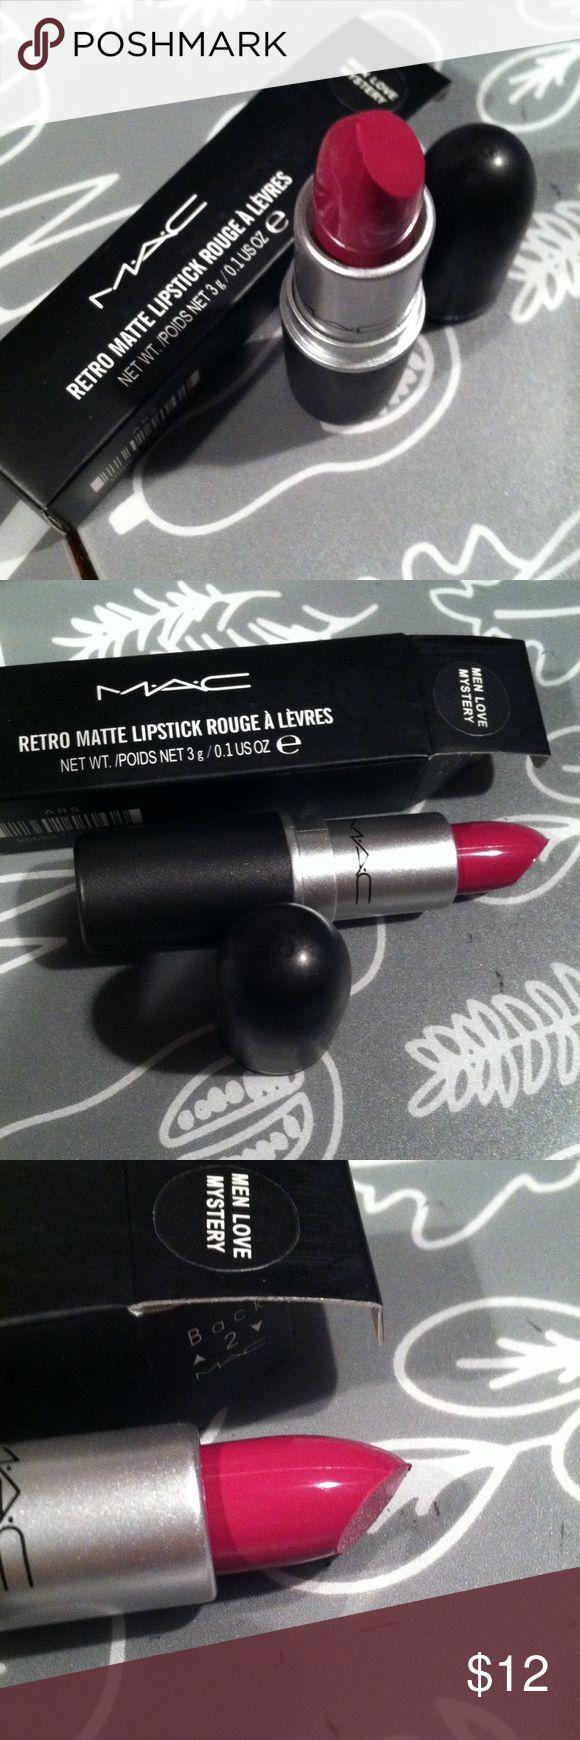 Mac retro matte lipstick in Men love mystery Brand new in box MAC Cosmetics Makeup Lipstick